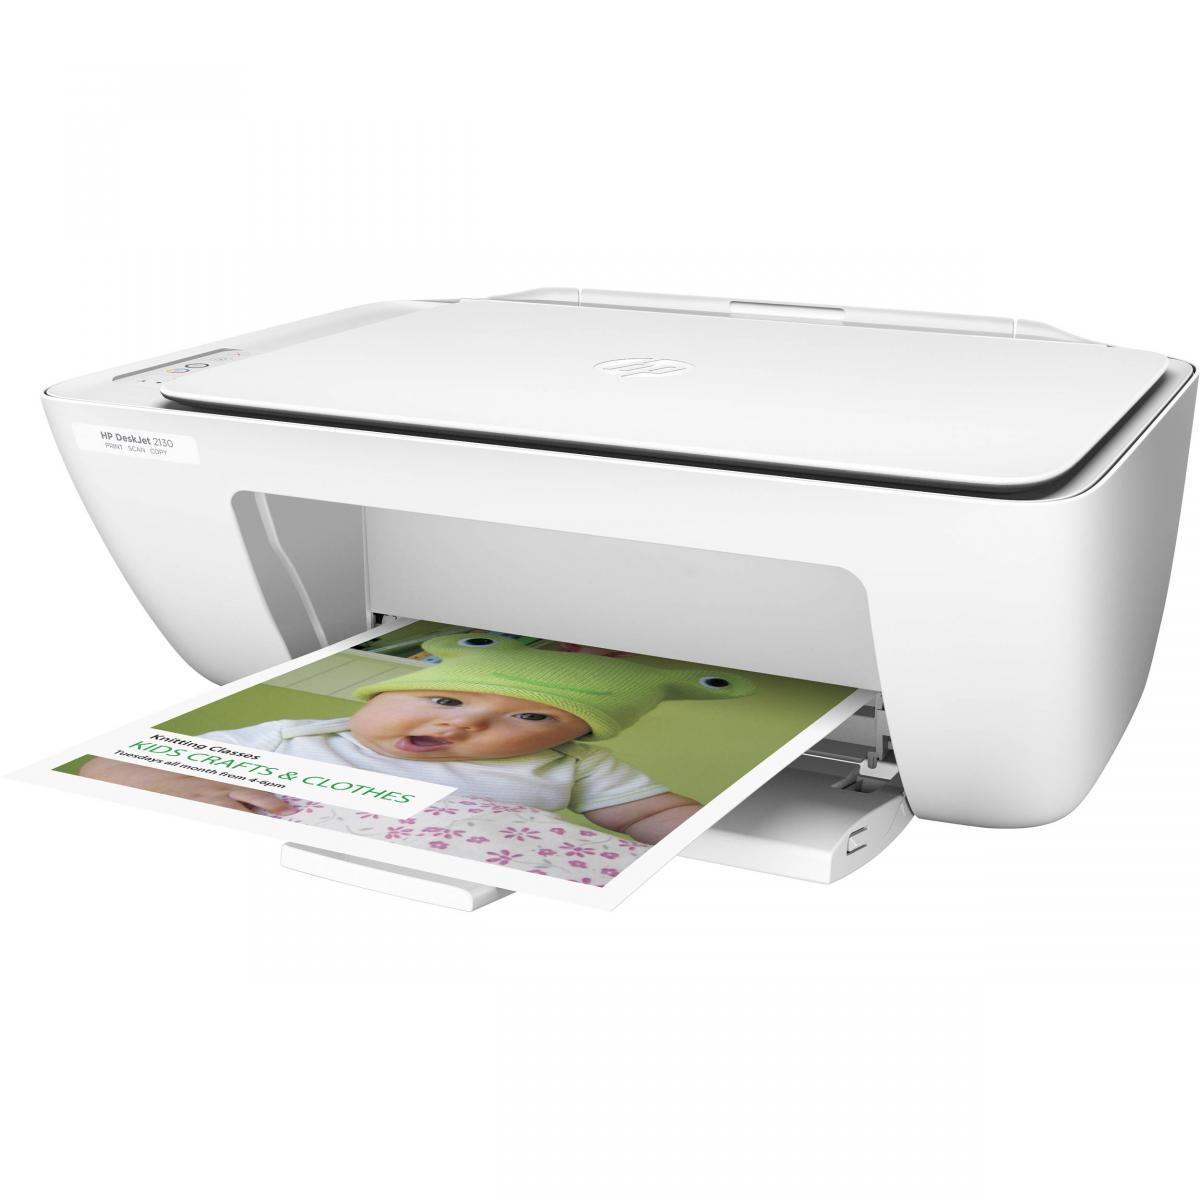 HP DeskJet 2130 All-in-One Printer   F5S40A#B1H   Smart ...